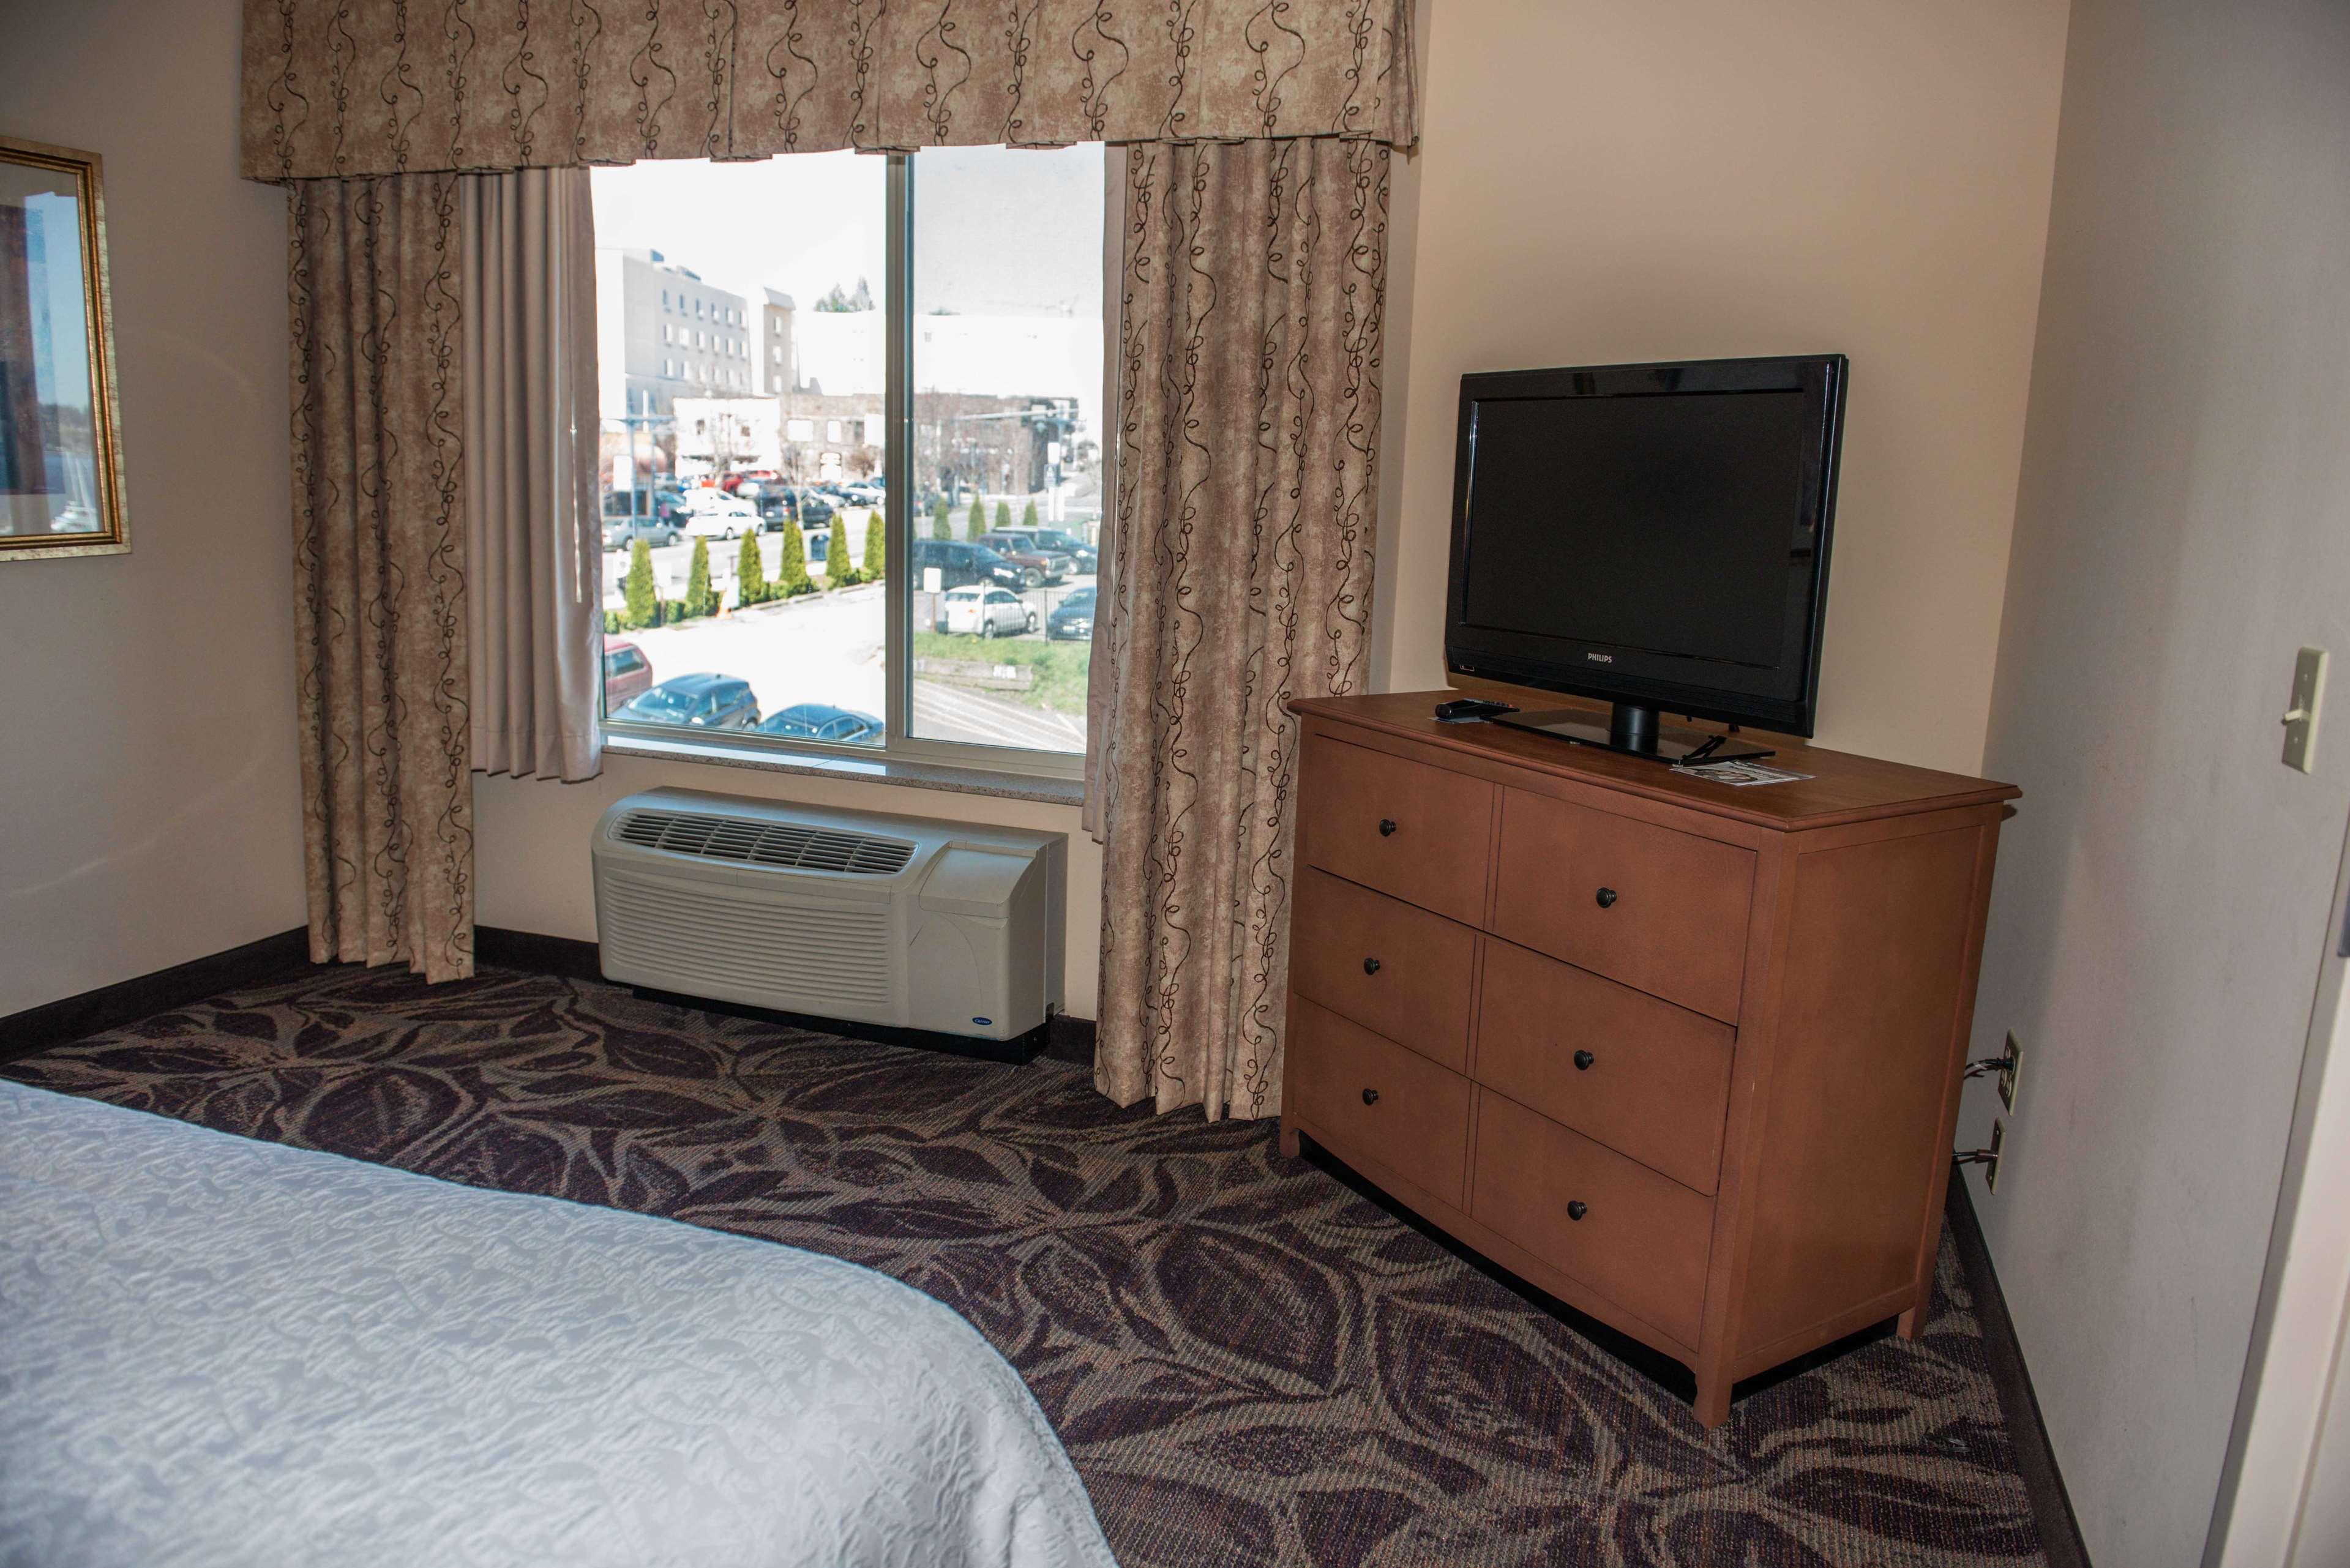 Hampton Inn & Suites Bremerton image 31